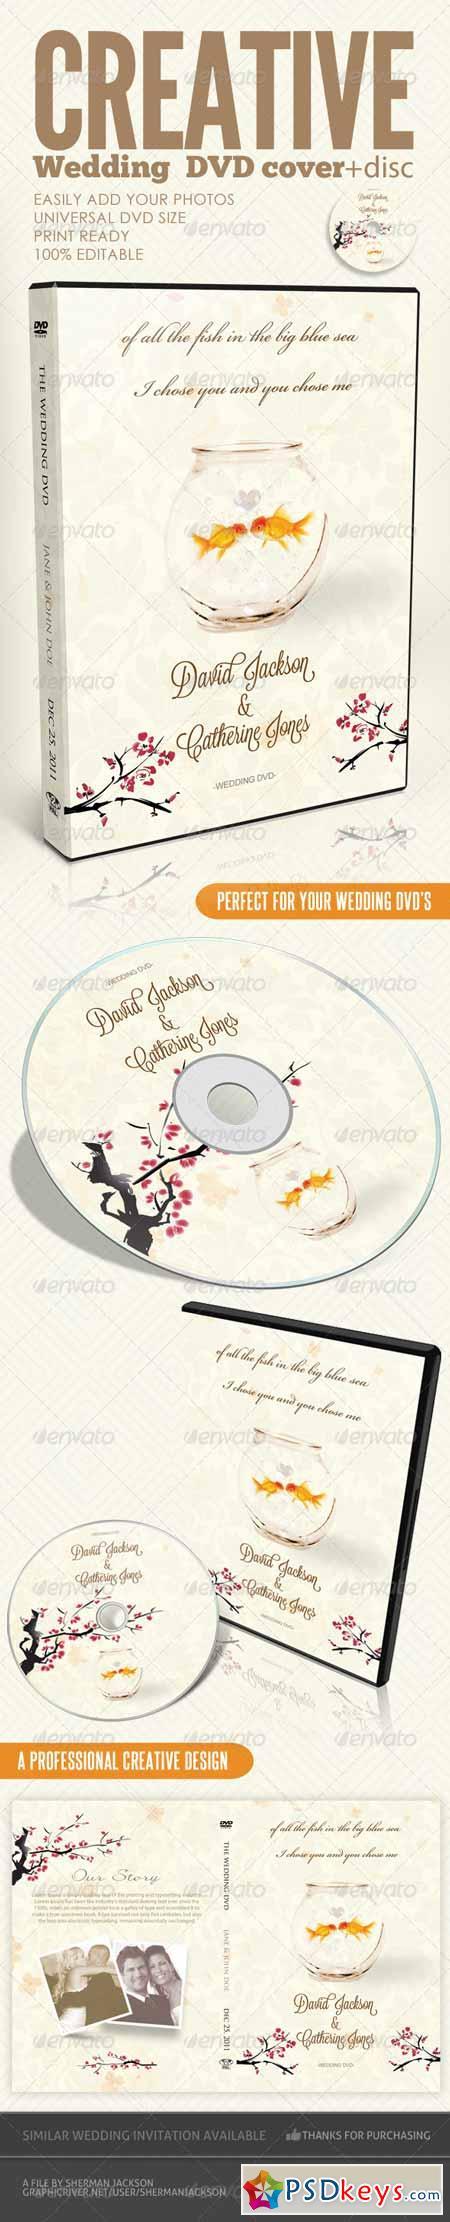 label dvd psd cd labels disc creative artwork via photoshop avery template newdesignfile psdkeys